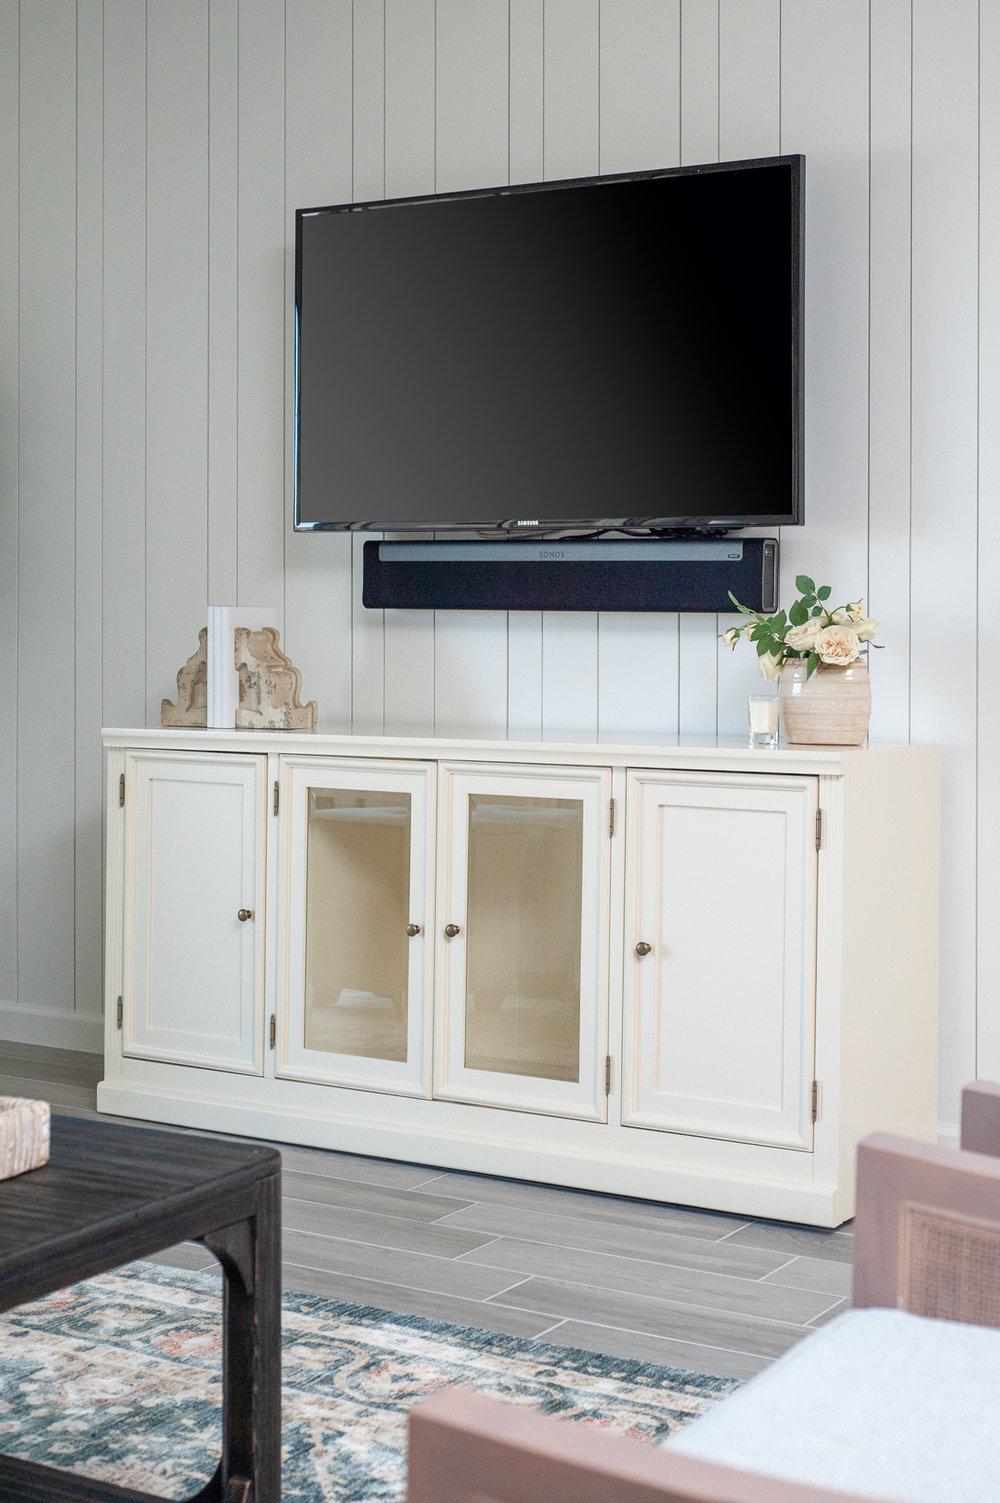 Micamy_Interior Designer_Design_Interior_Model_Merchandising_Living_Room_Universal_Furniture_Traditional_Transitional_Ballard_Entertainment_Shiplap_Rug_Accessory.jpg